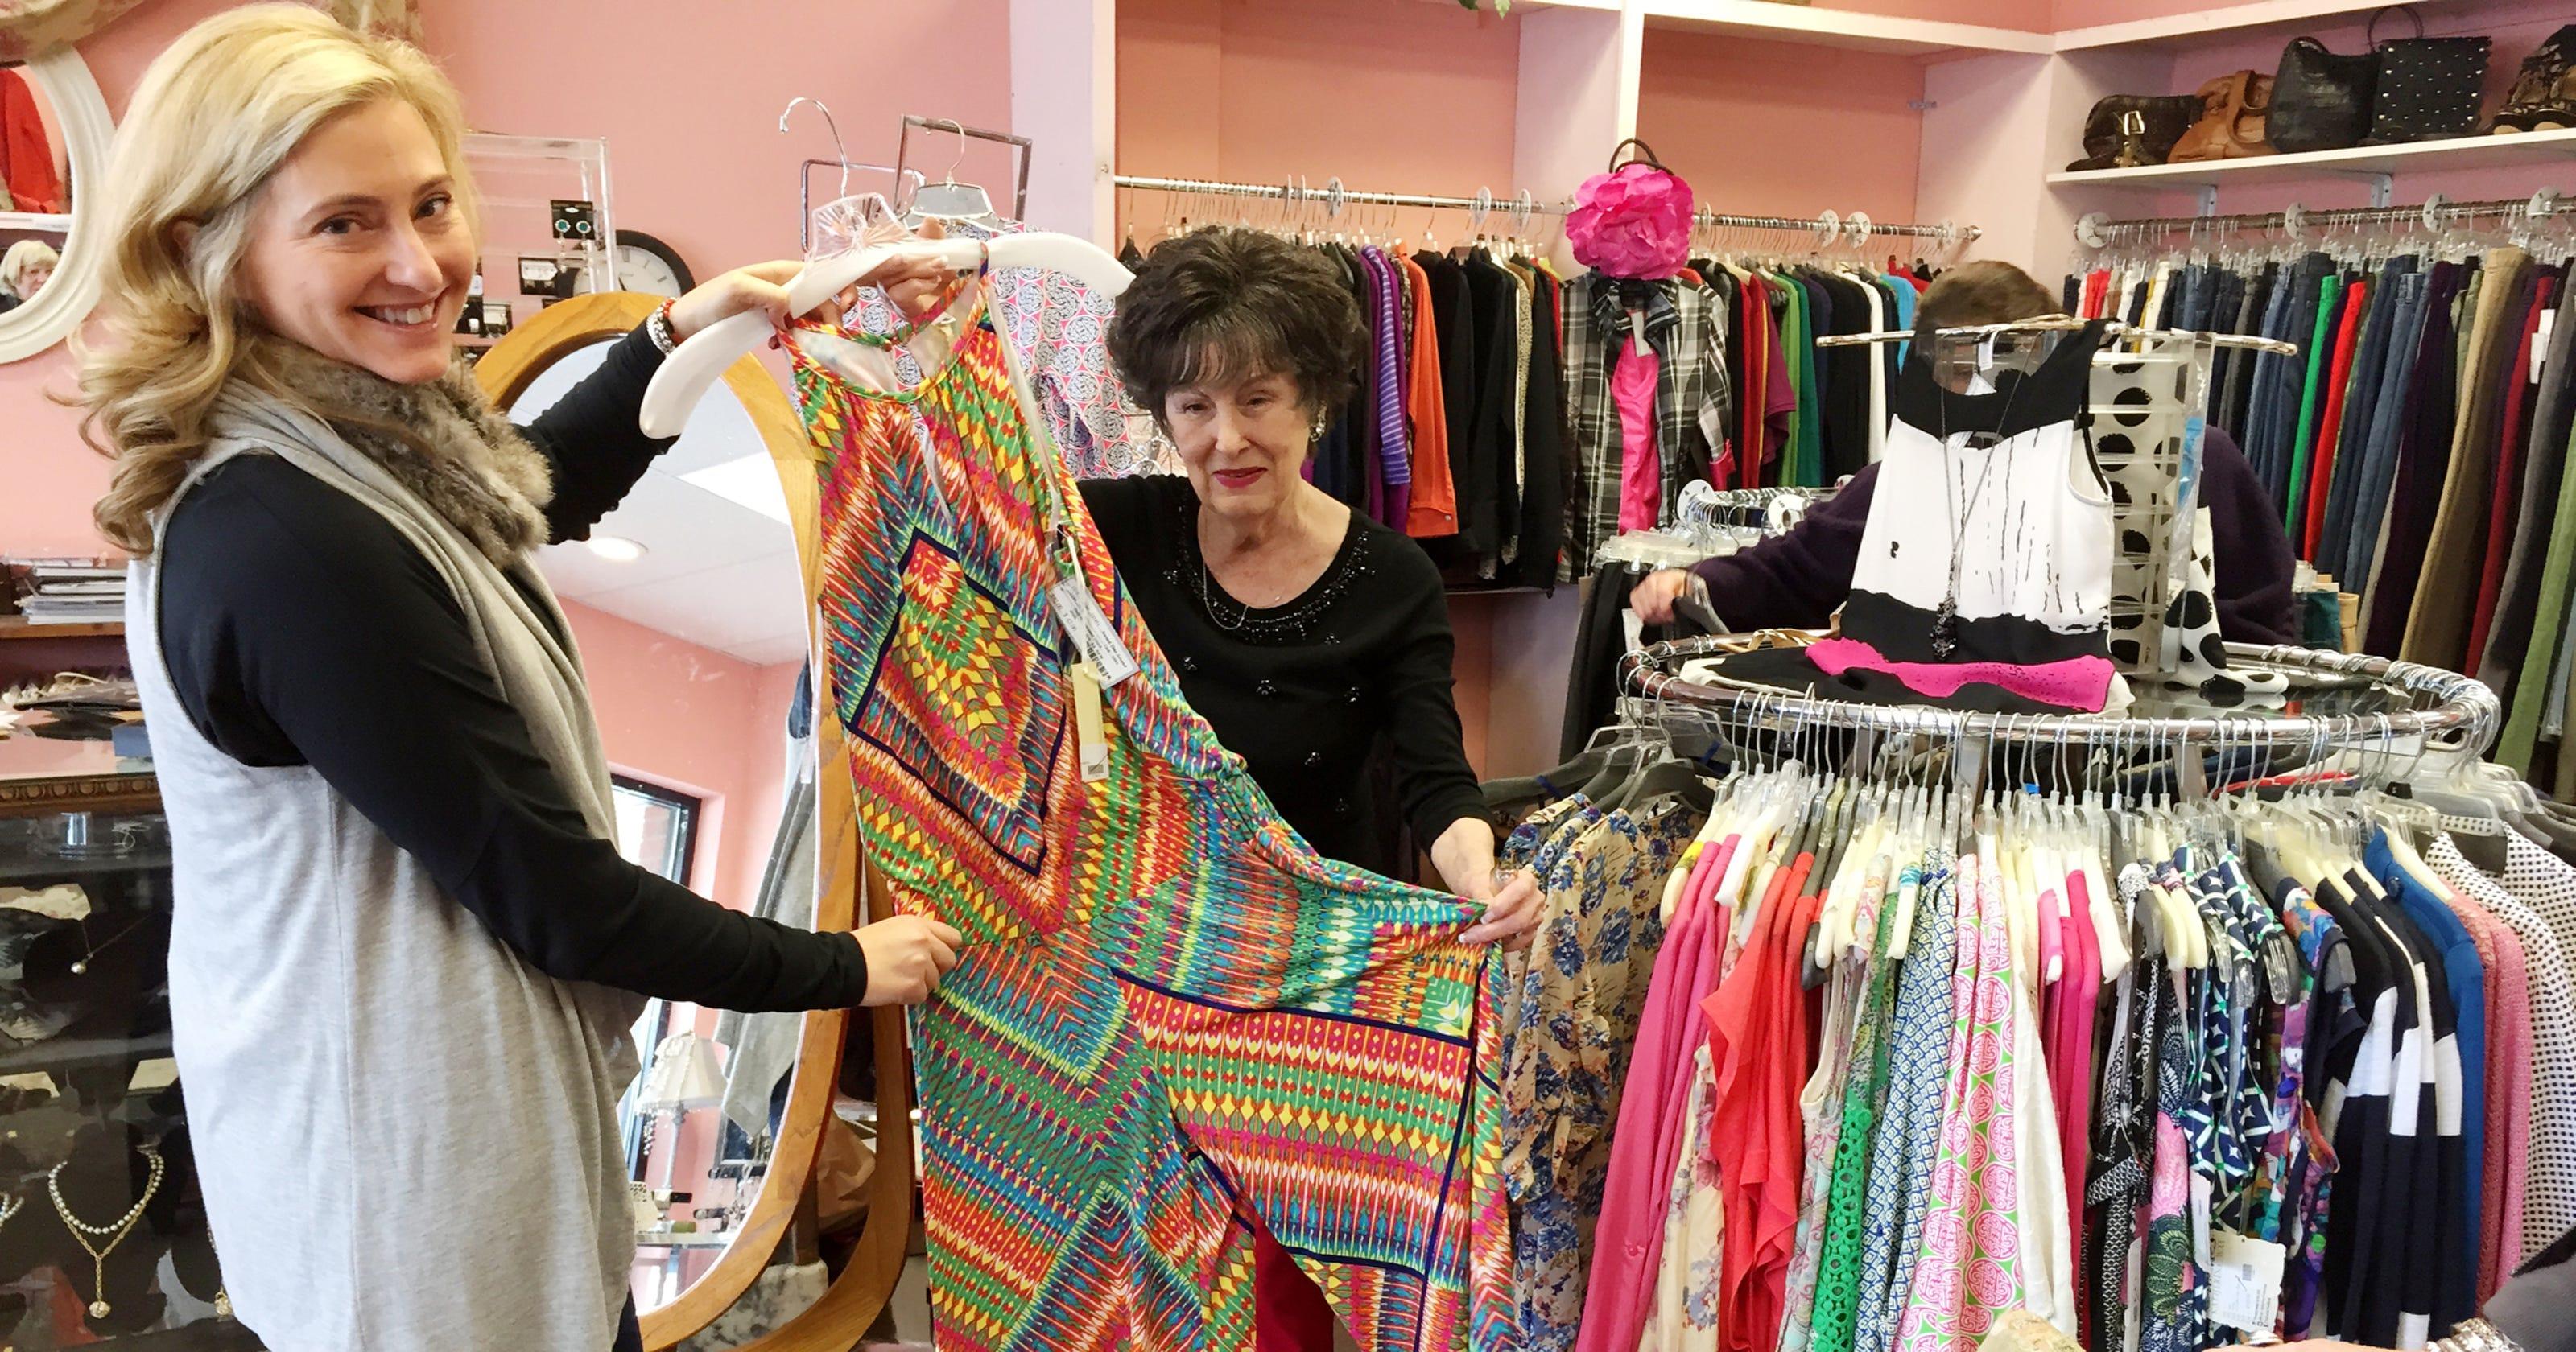 Ms Cheaps Tour Of Nashvilles Ladies Consignment Stores